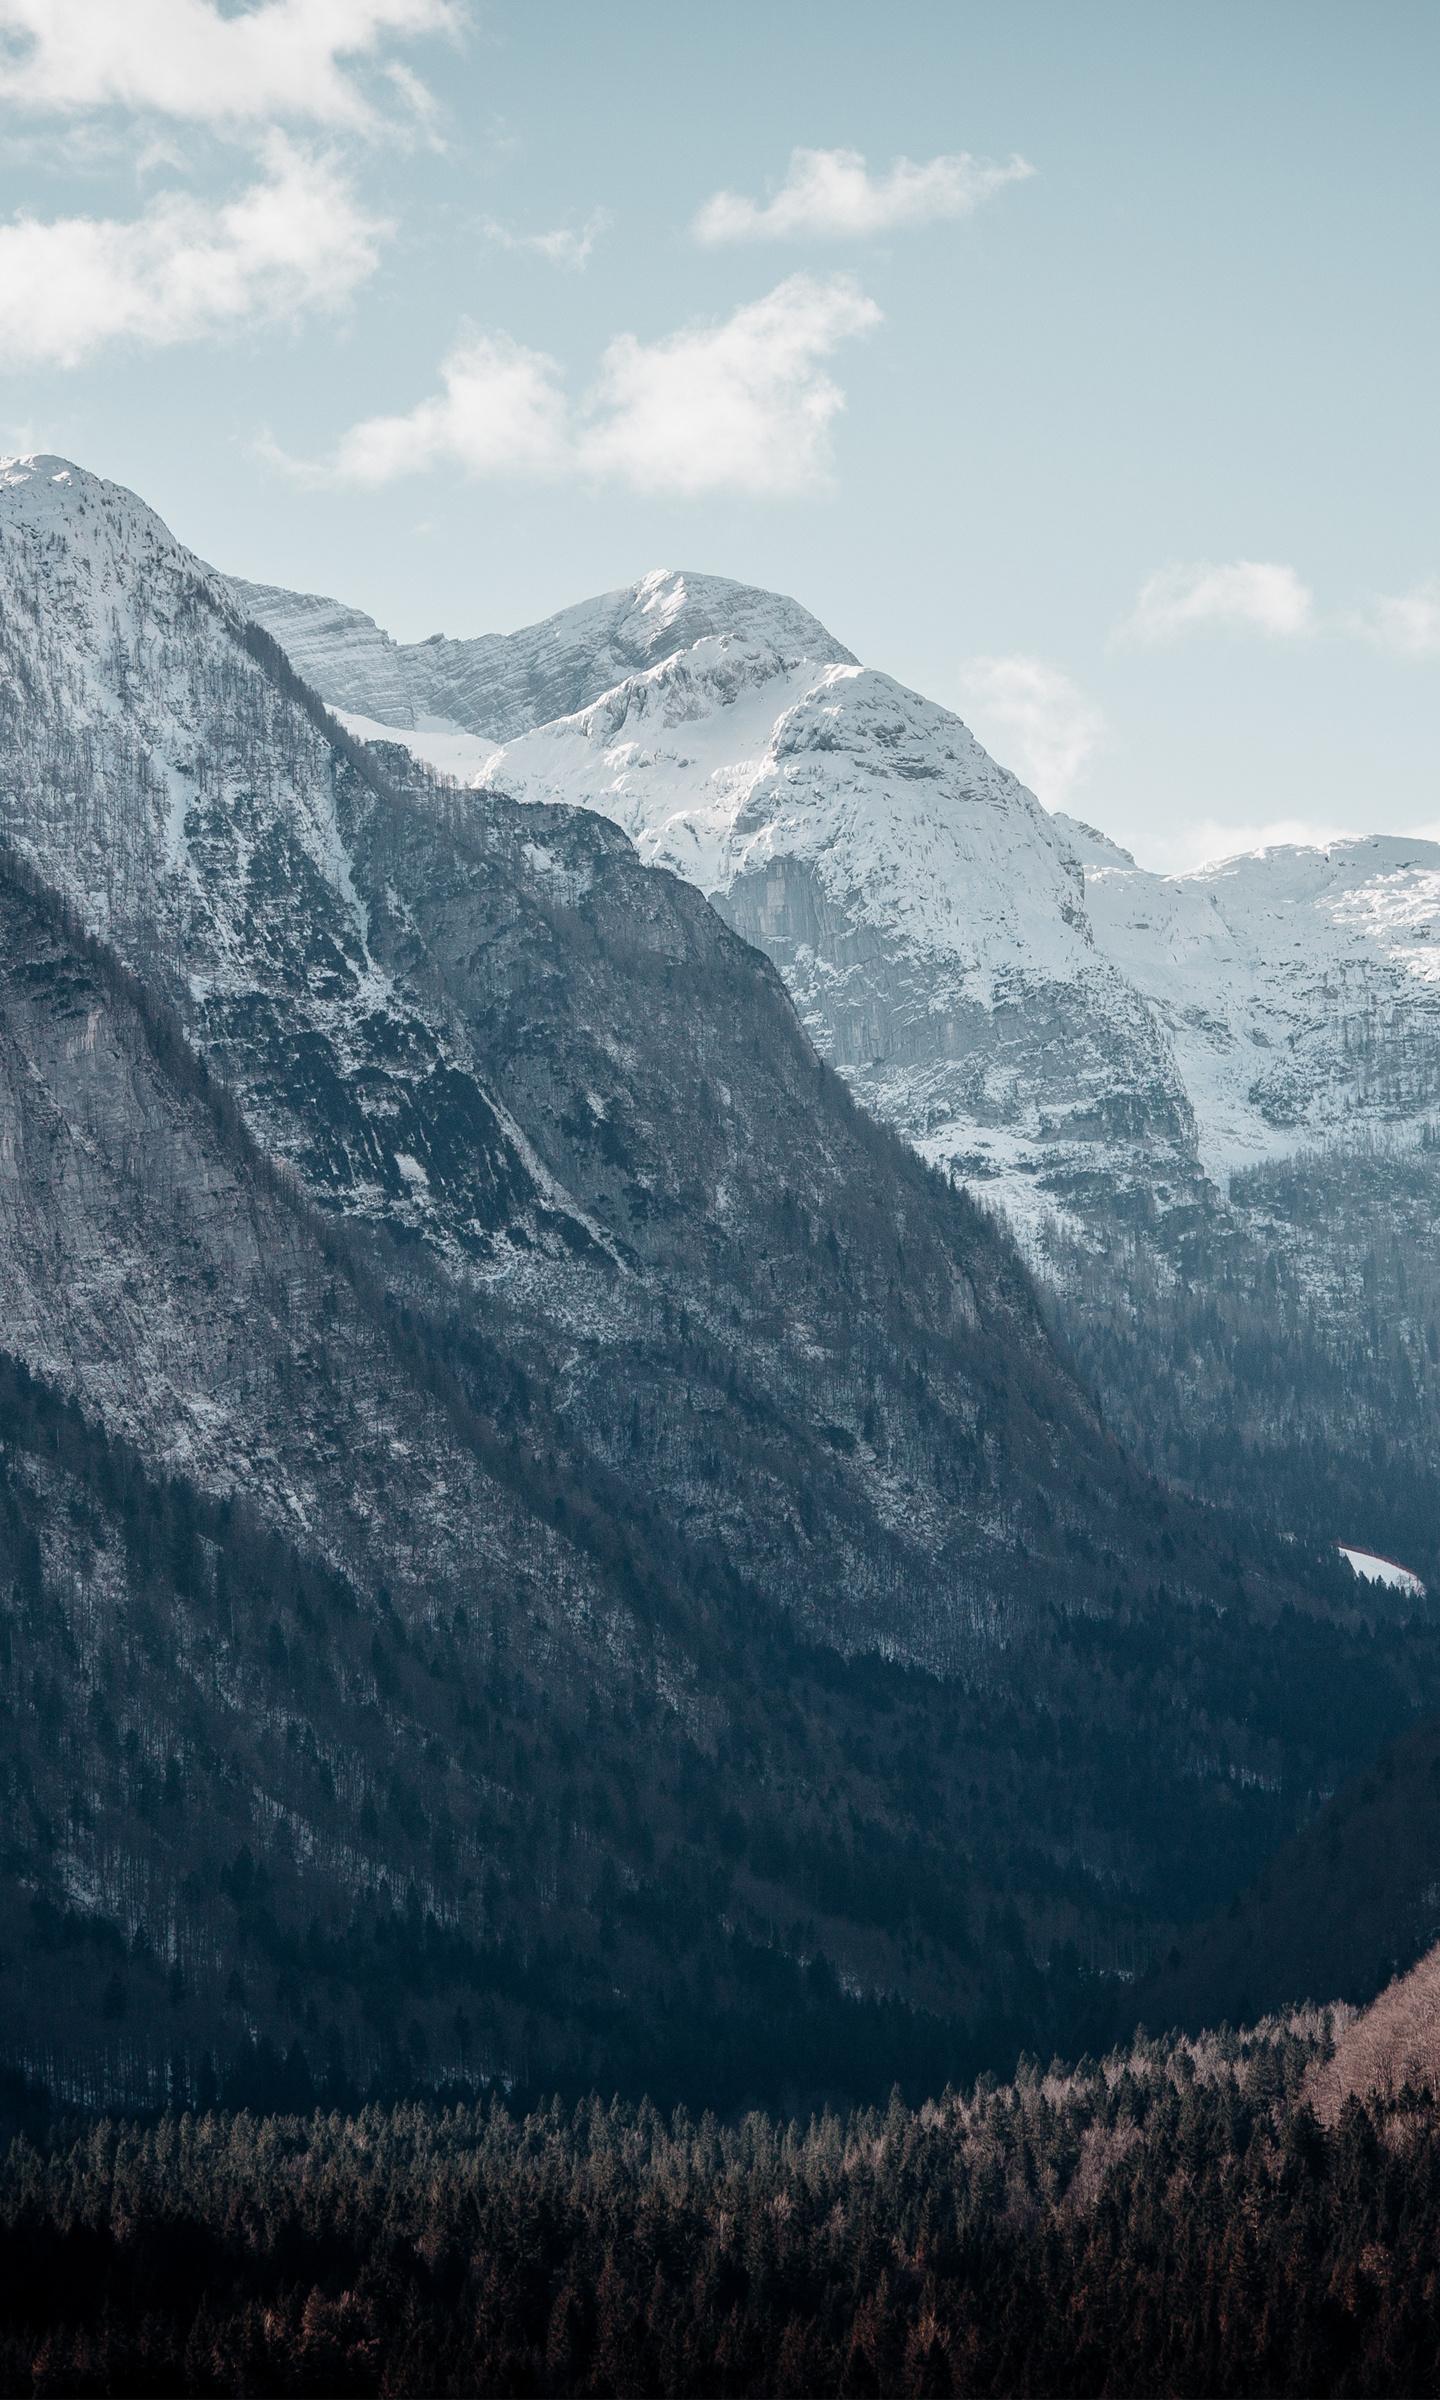 Download Wallpaper Mountain Samsung Galaxy S7 - mountain_peaks_valley_4k  Photograph_873021.jpg